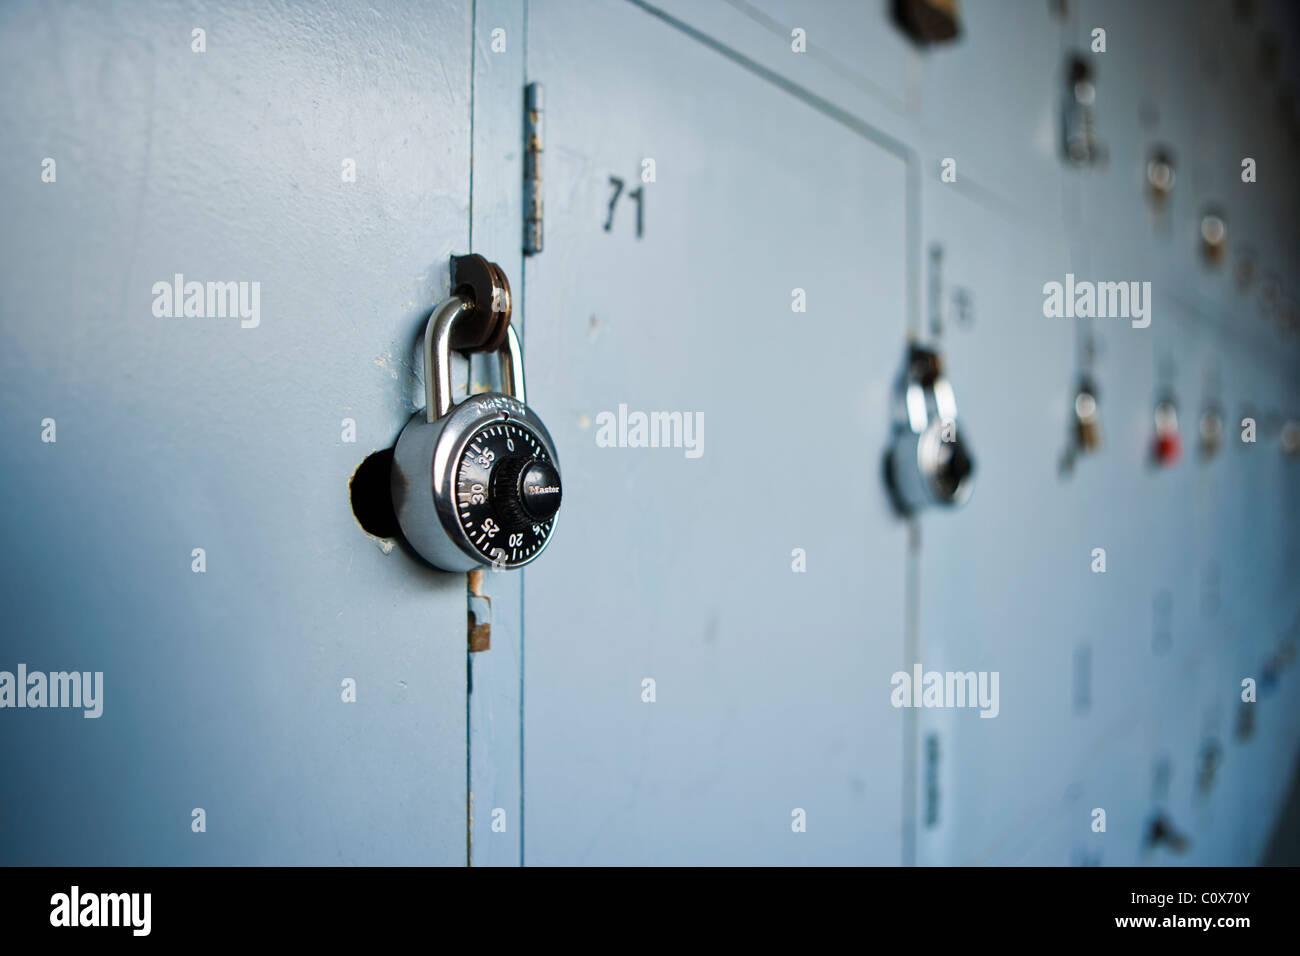 School lockers with padlocks. - Stock Image